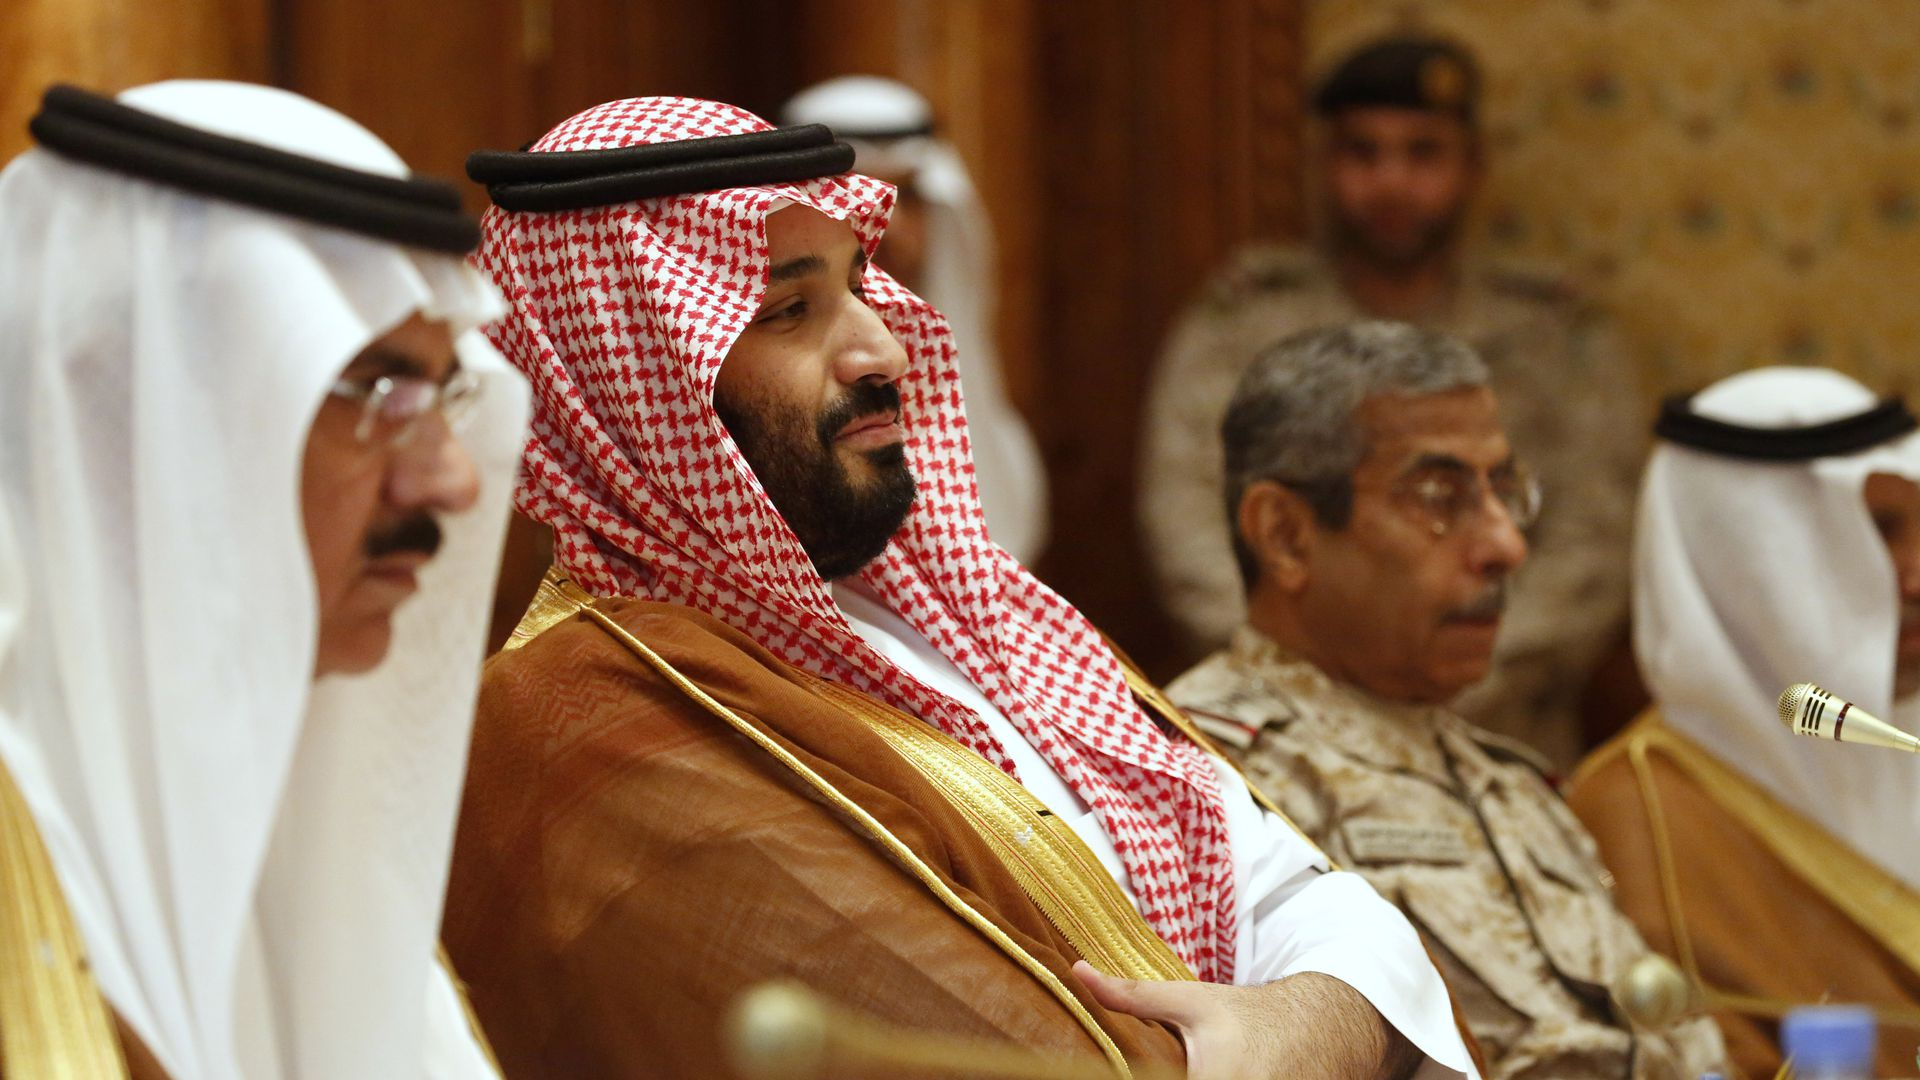 The Saudi crown prince during Defense Secretary James Mattis' visit to Riyadh last year